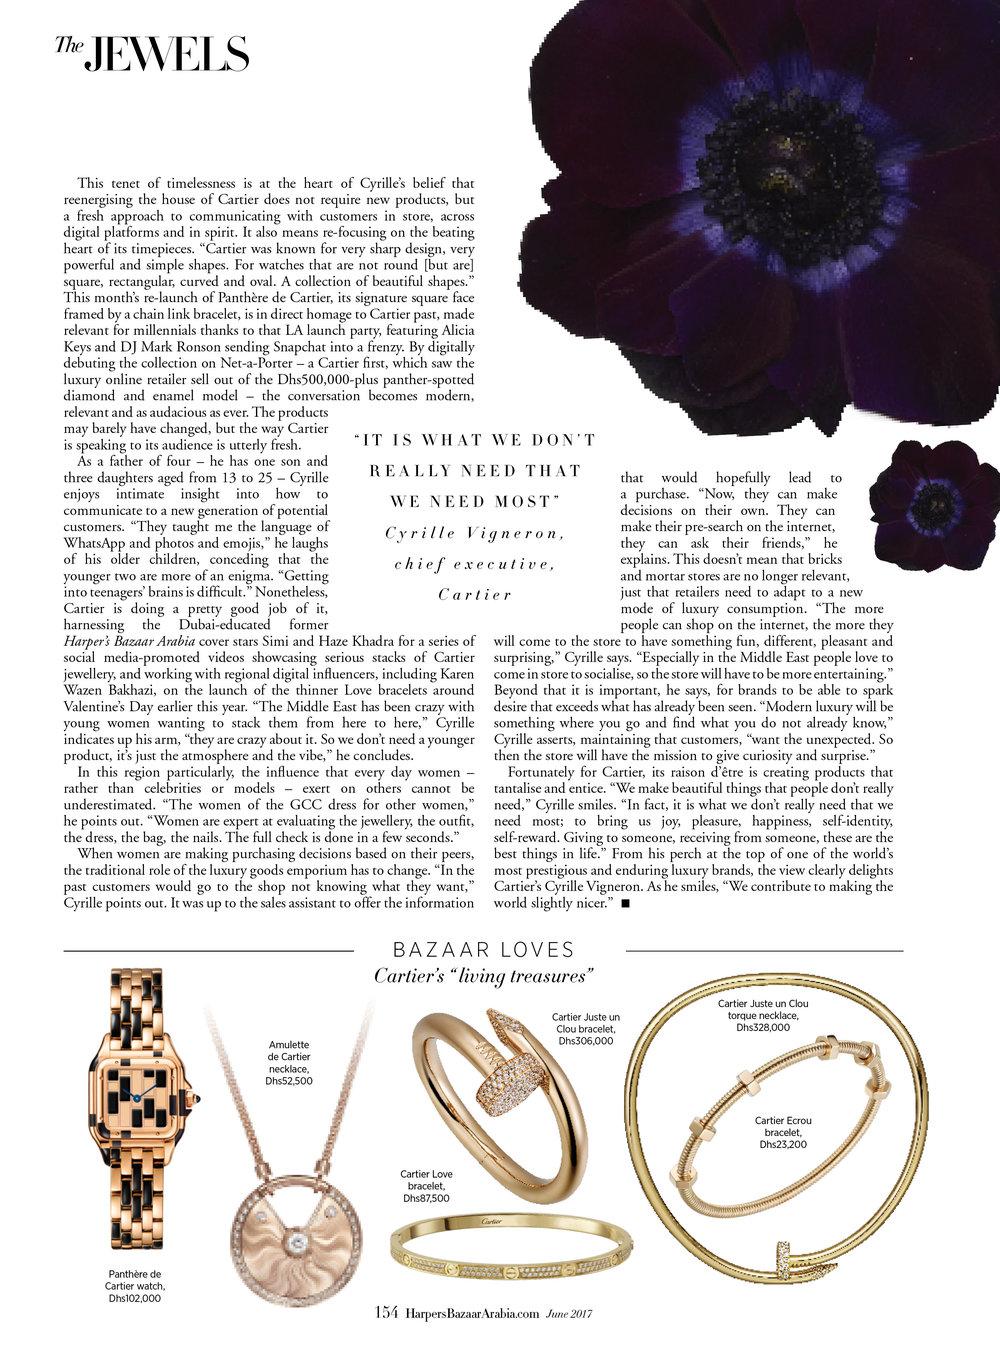 Cartier CEO, June 2017 2.jpg